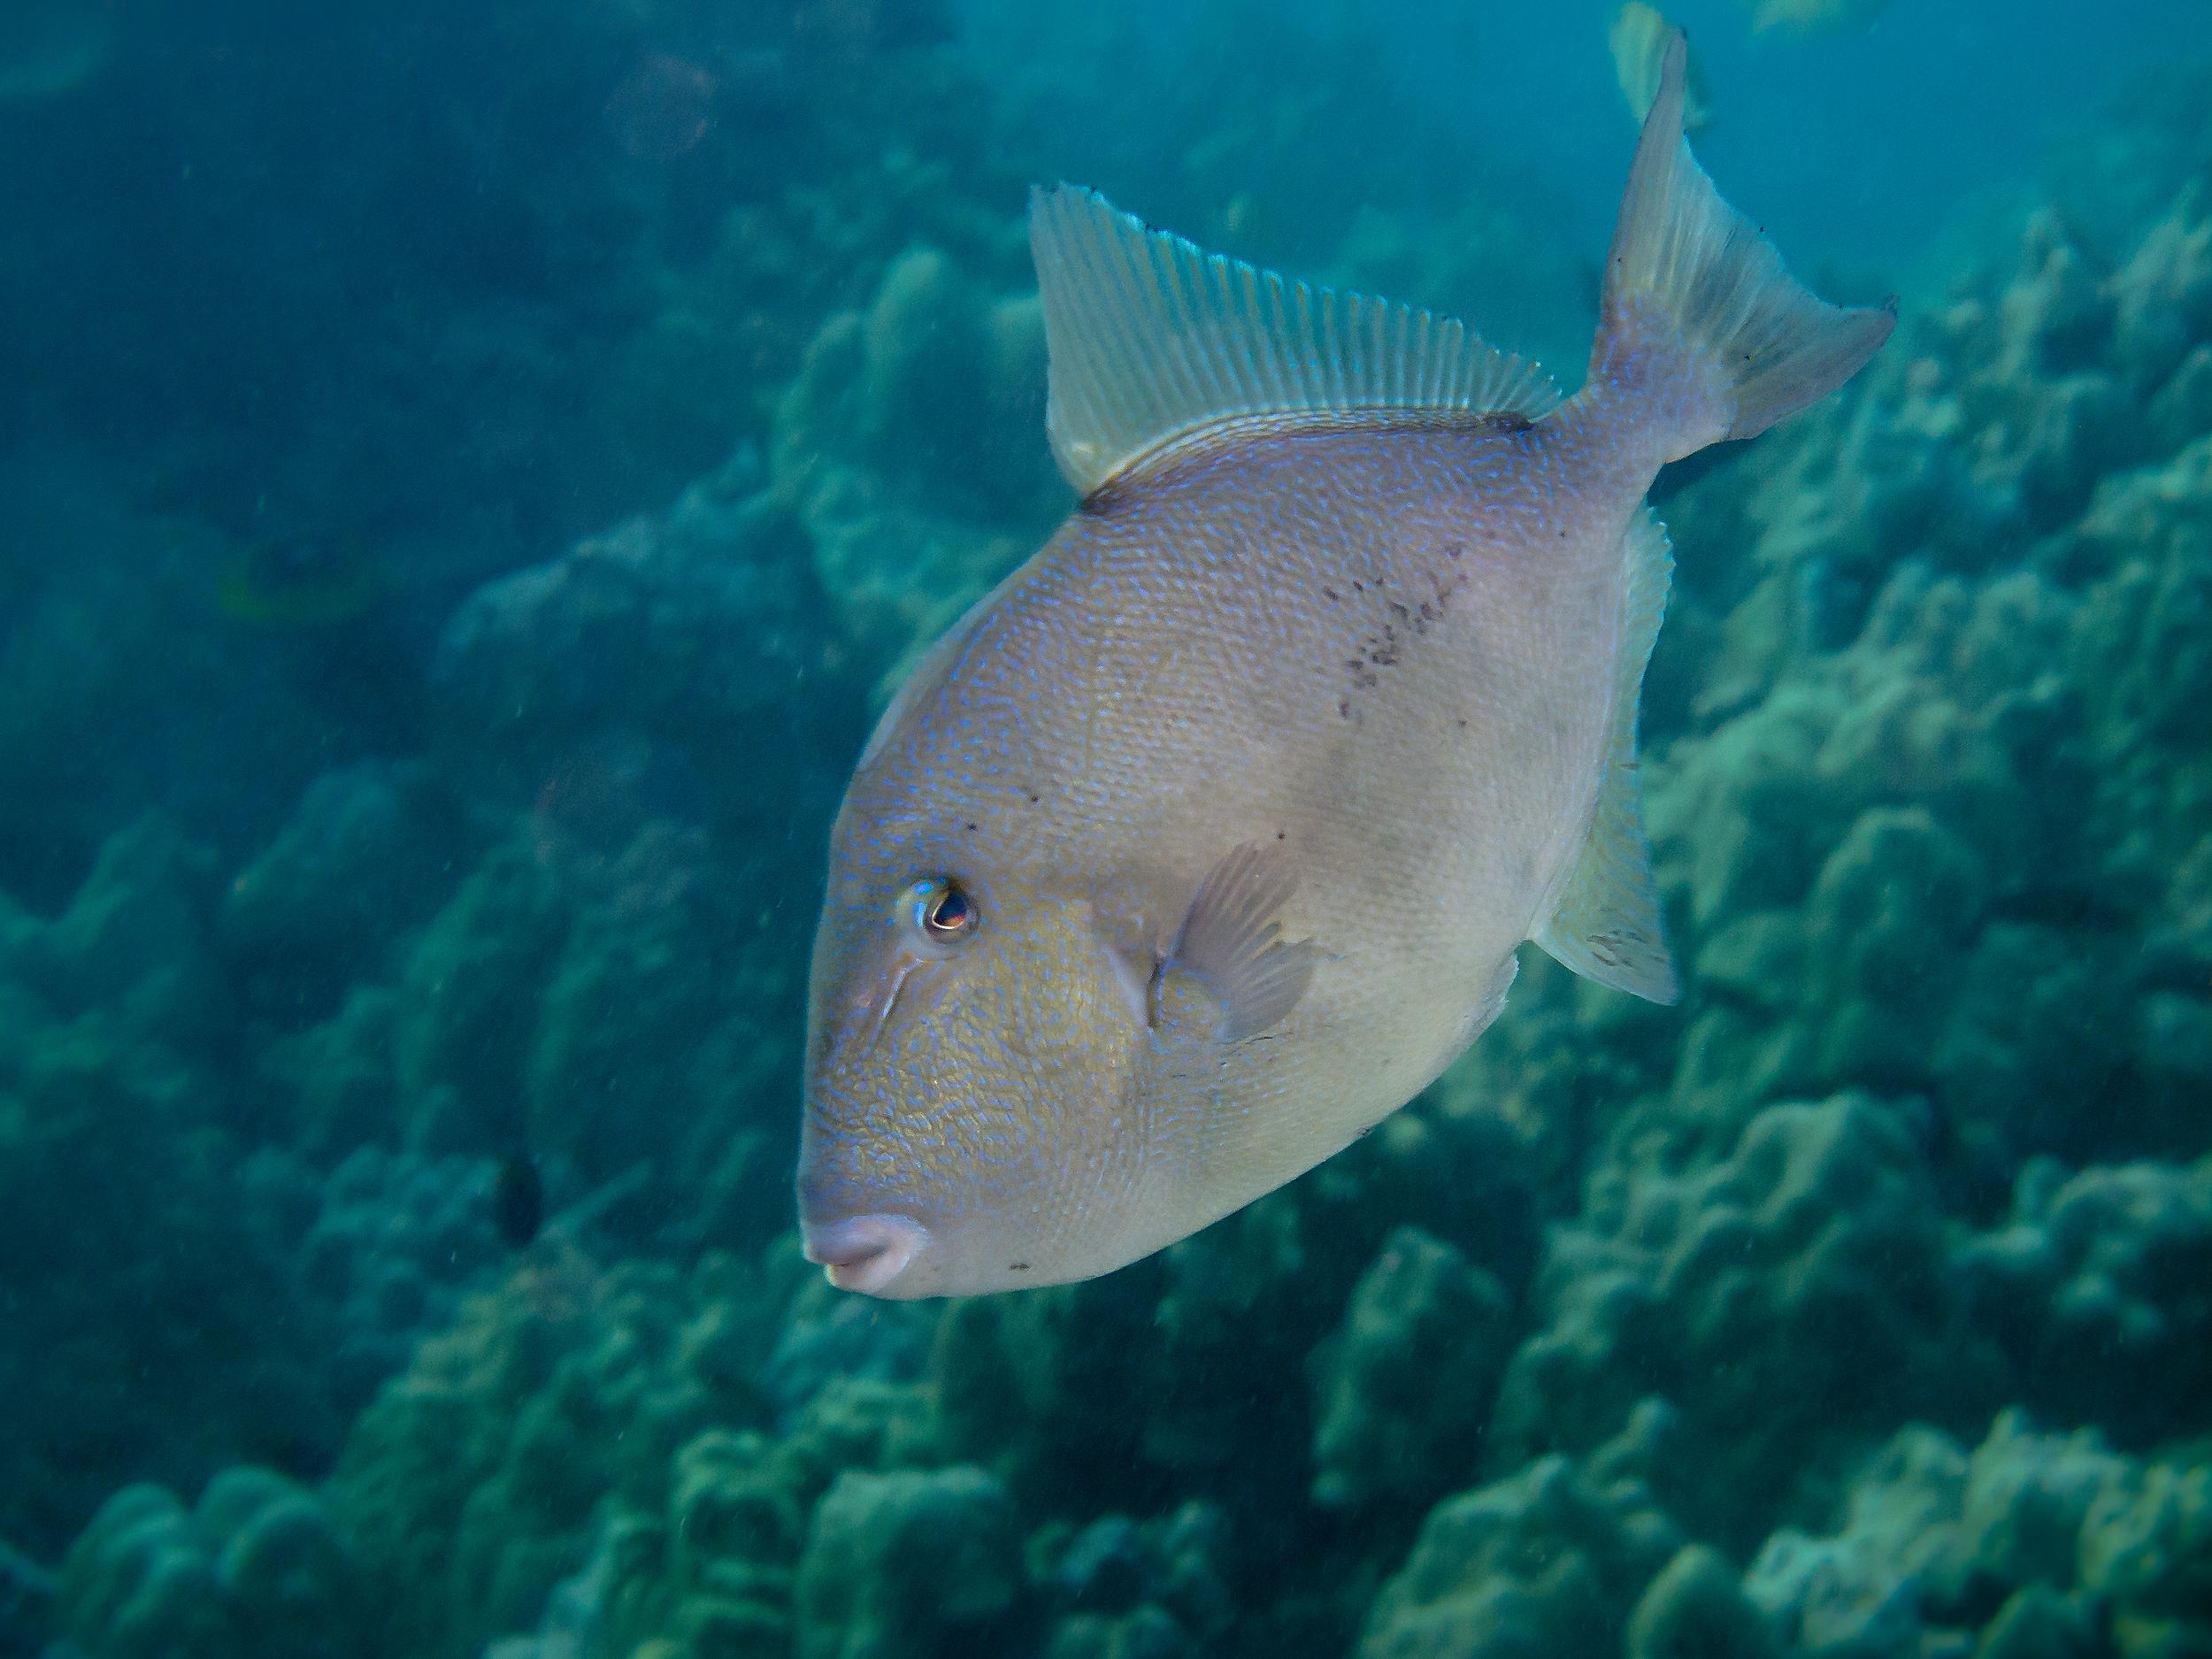 finescale triggerfish u2014 david rafalovich photography